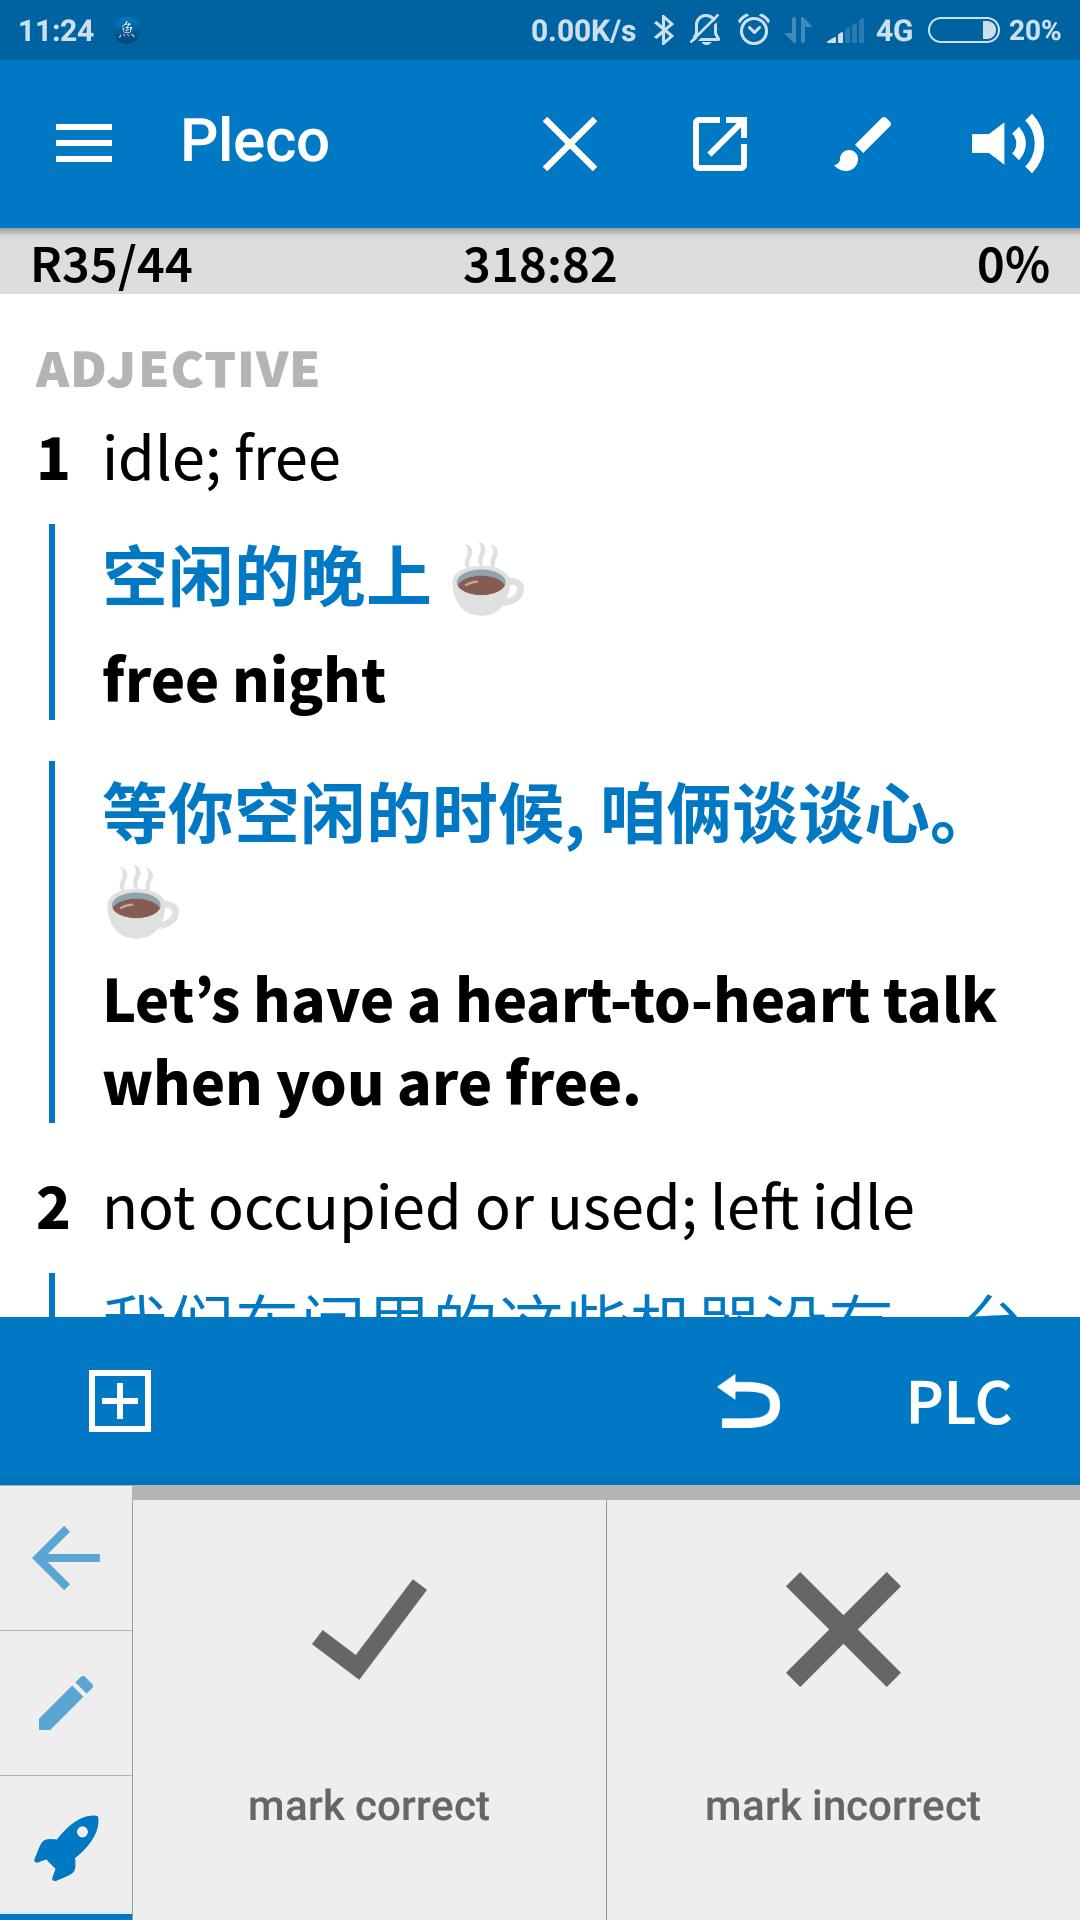 Screenshot_2017-12-07-11-24-55-911_com.pleco.chinesesystem.png